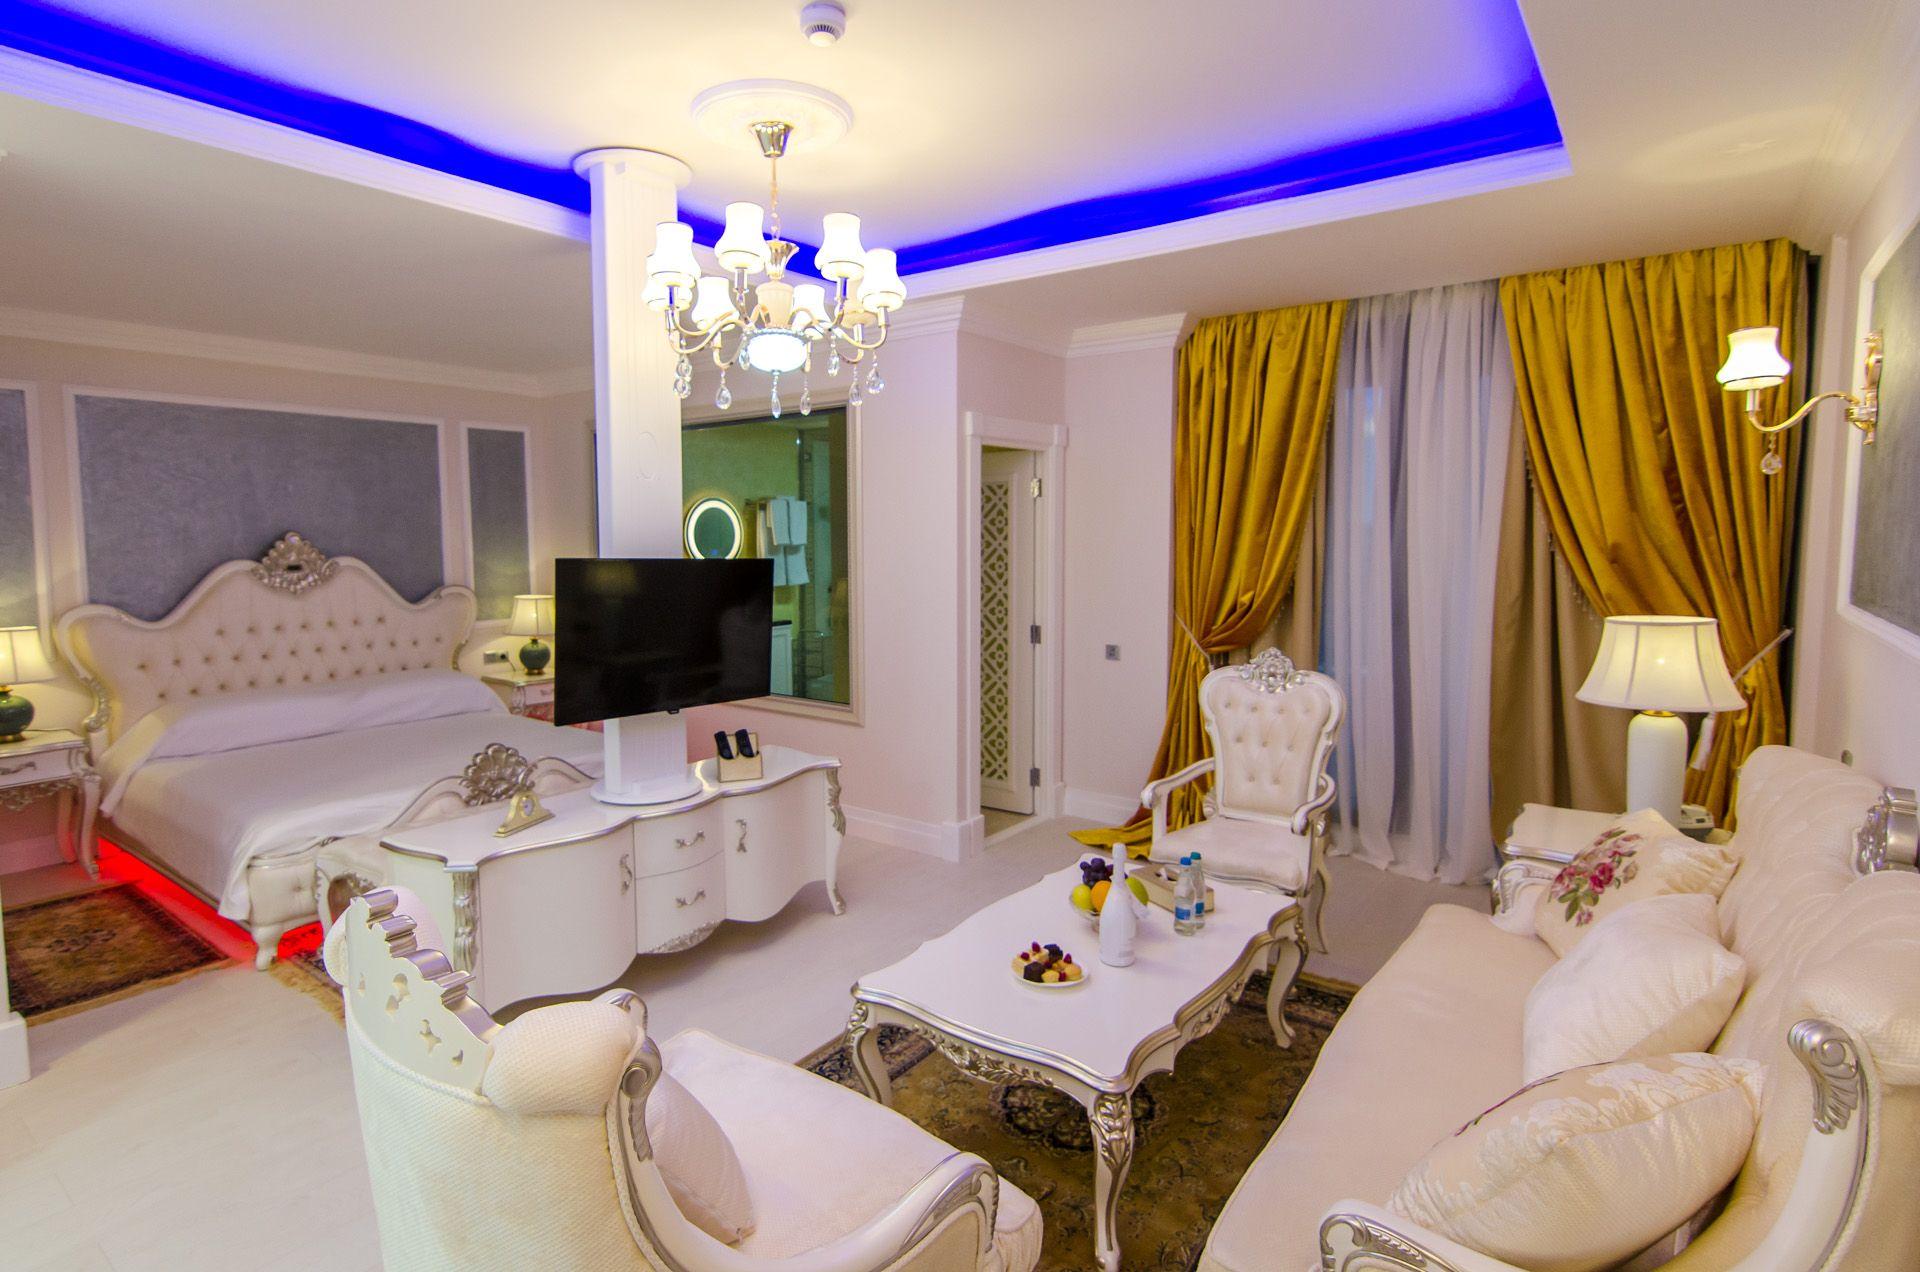 Deluxe Suit Luxurious Suit Hotel Seaside 5 Star Hotel Room